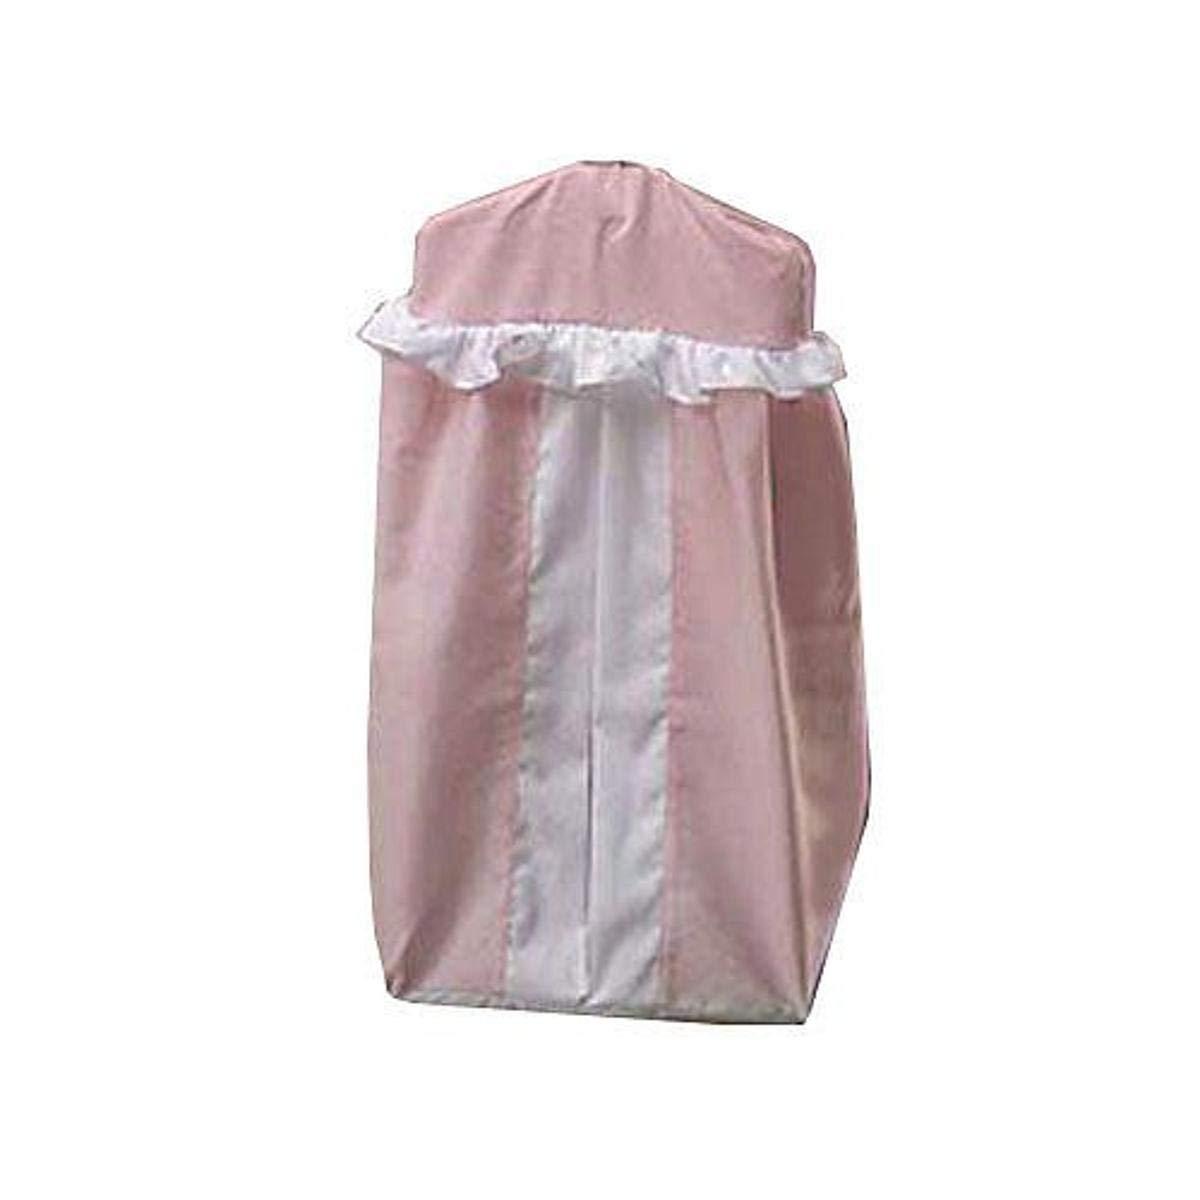 Baby Doll Bedding Regal Pique Diaper Stacker, Pink